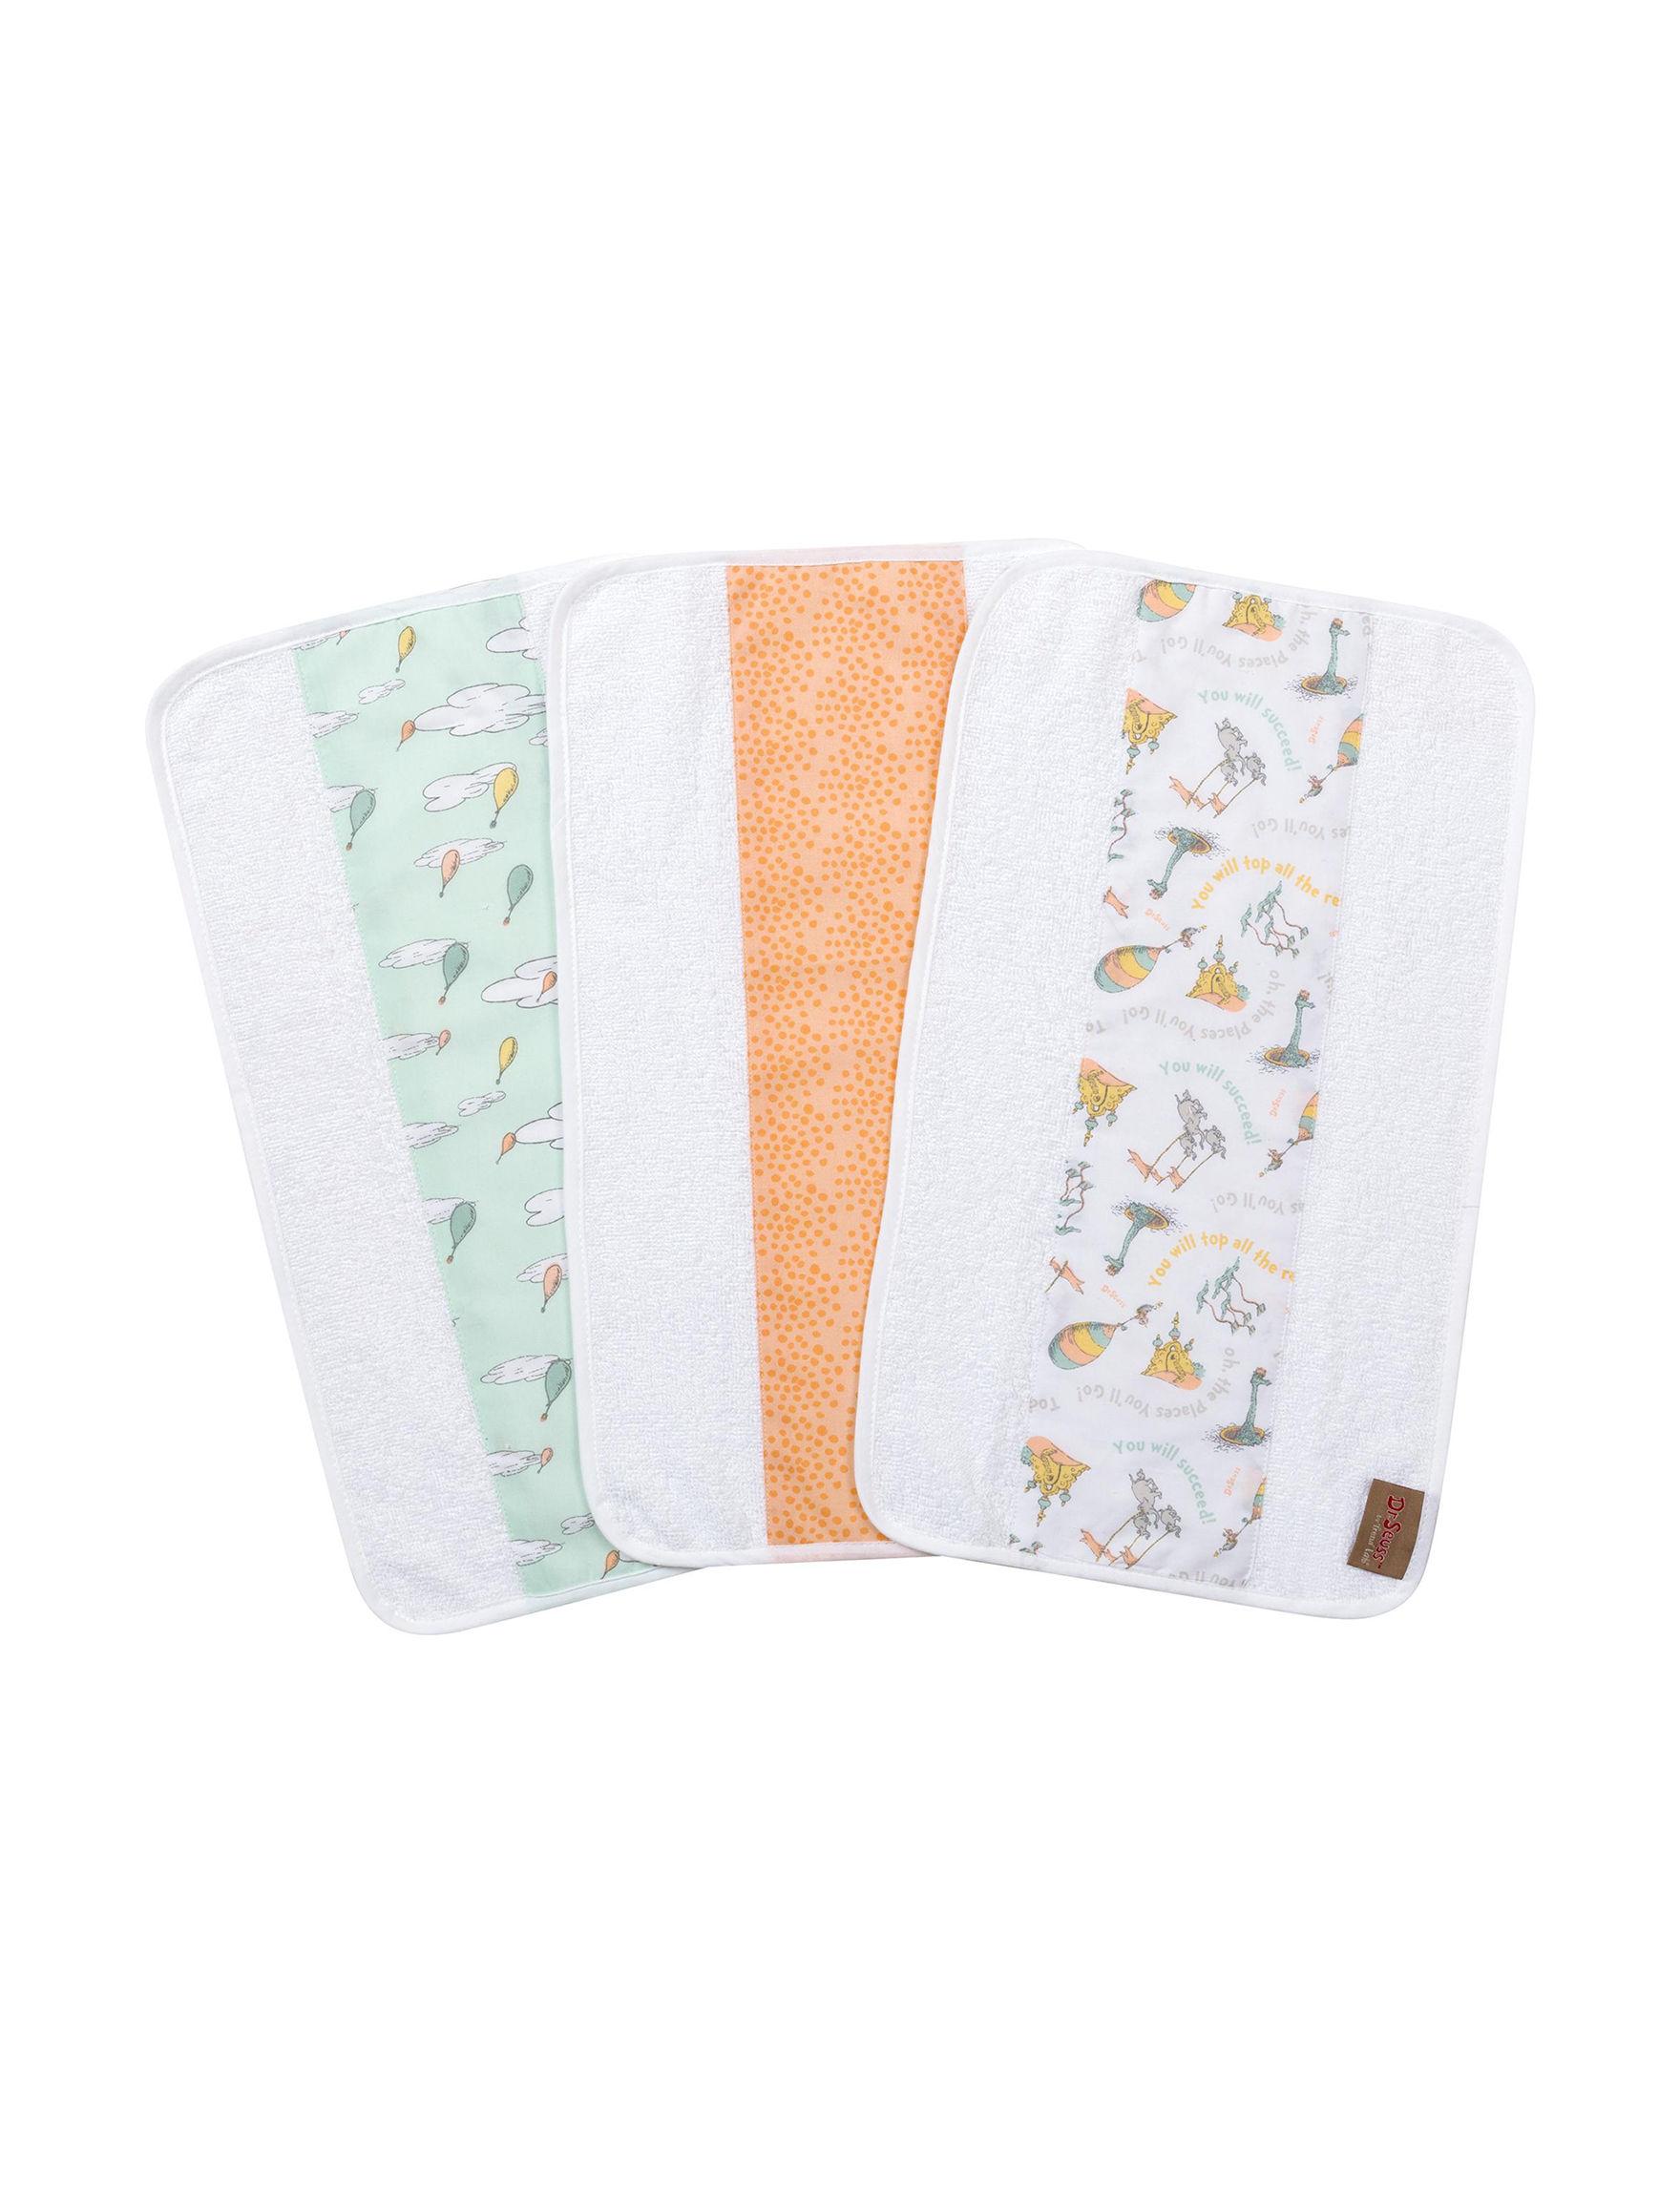 Trend Lab White Multi Bibs & Burp Cloths